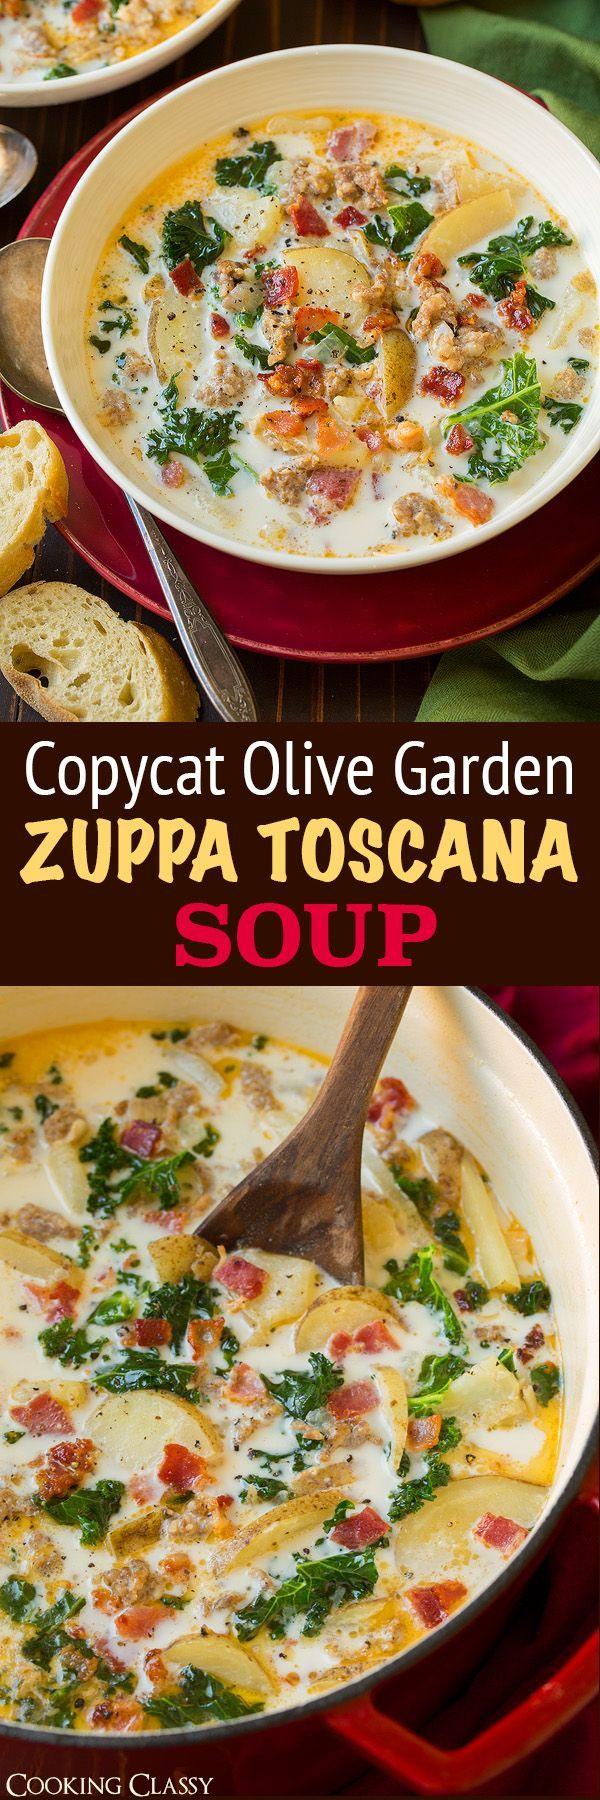 Zuppa Toscana Soup Olive Garden Copycat Recipe Olive Garden - Olive garden house salad